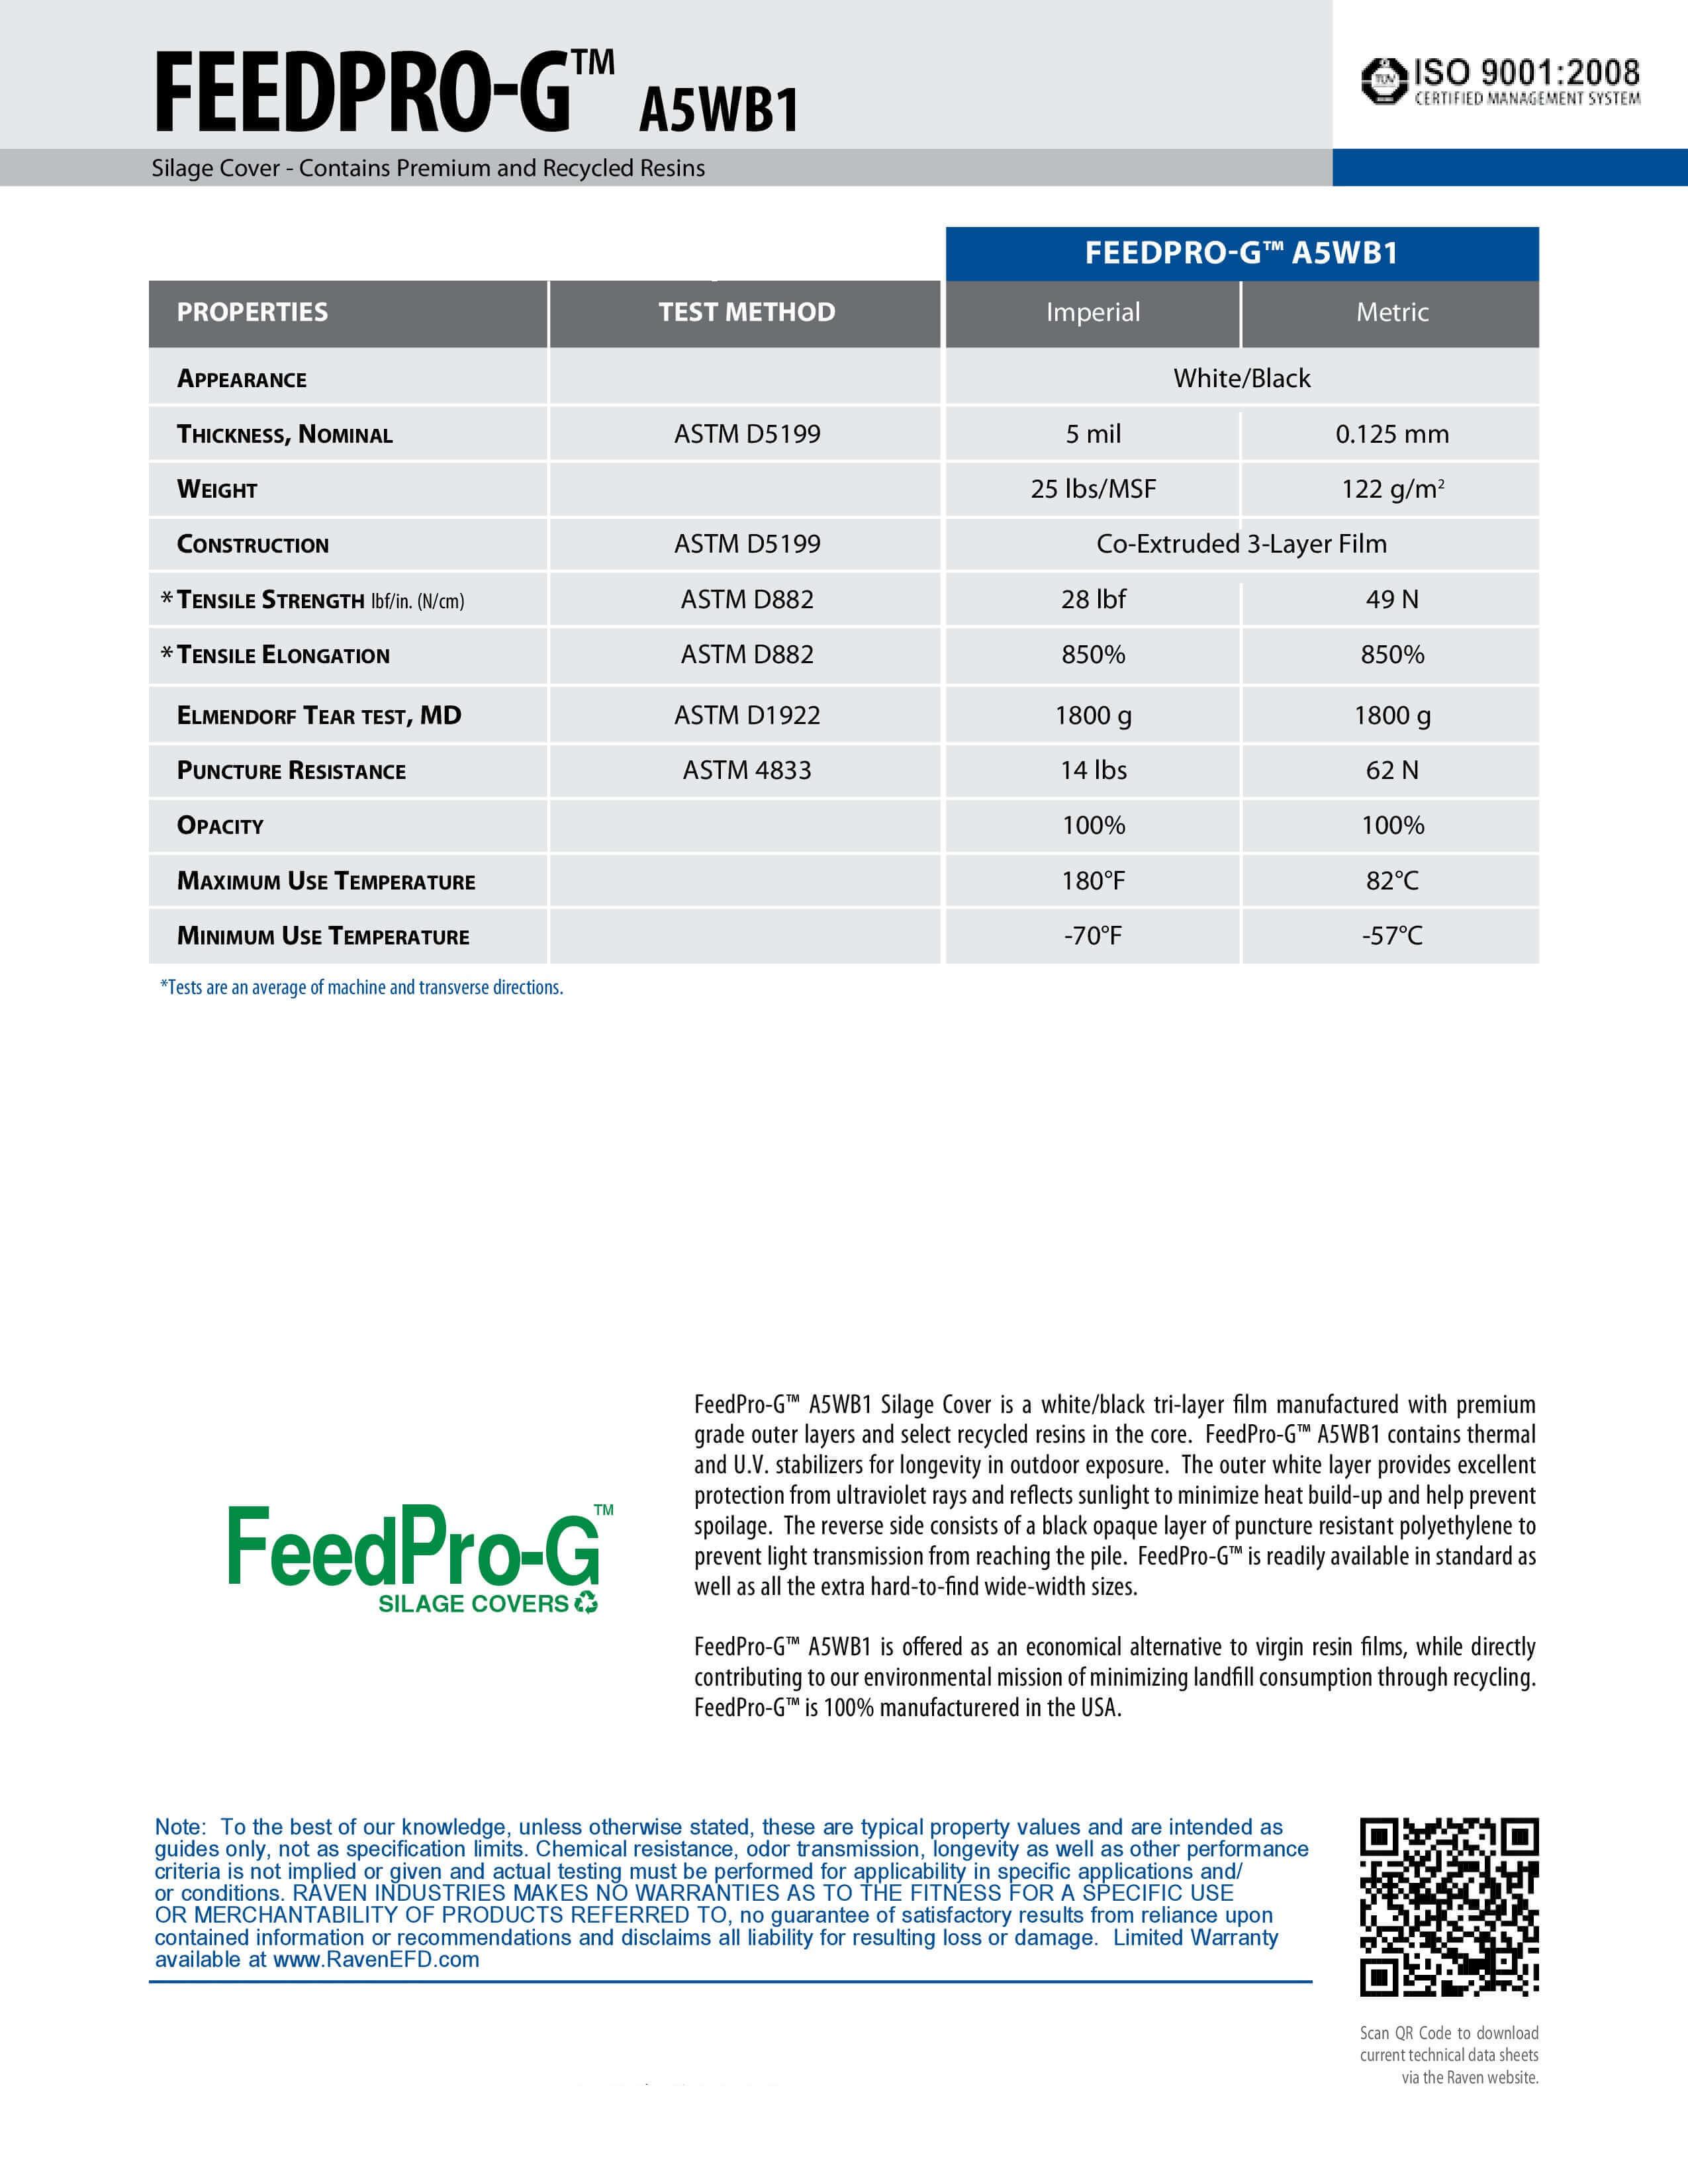 Feed Pro-G